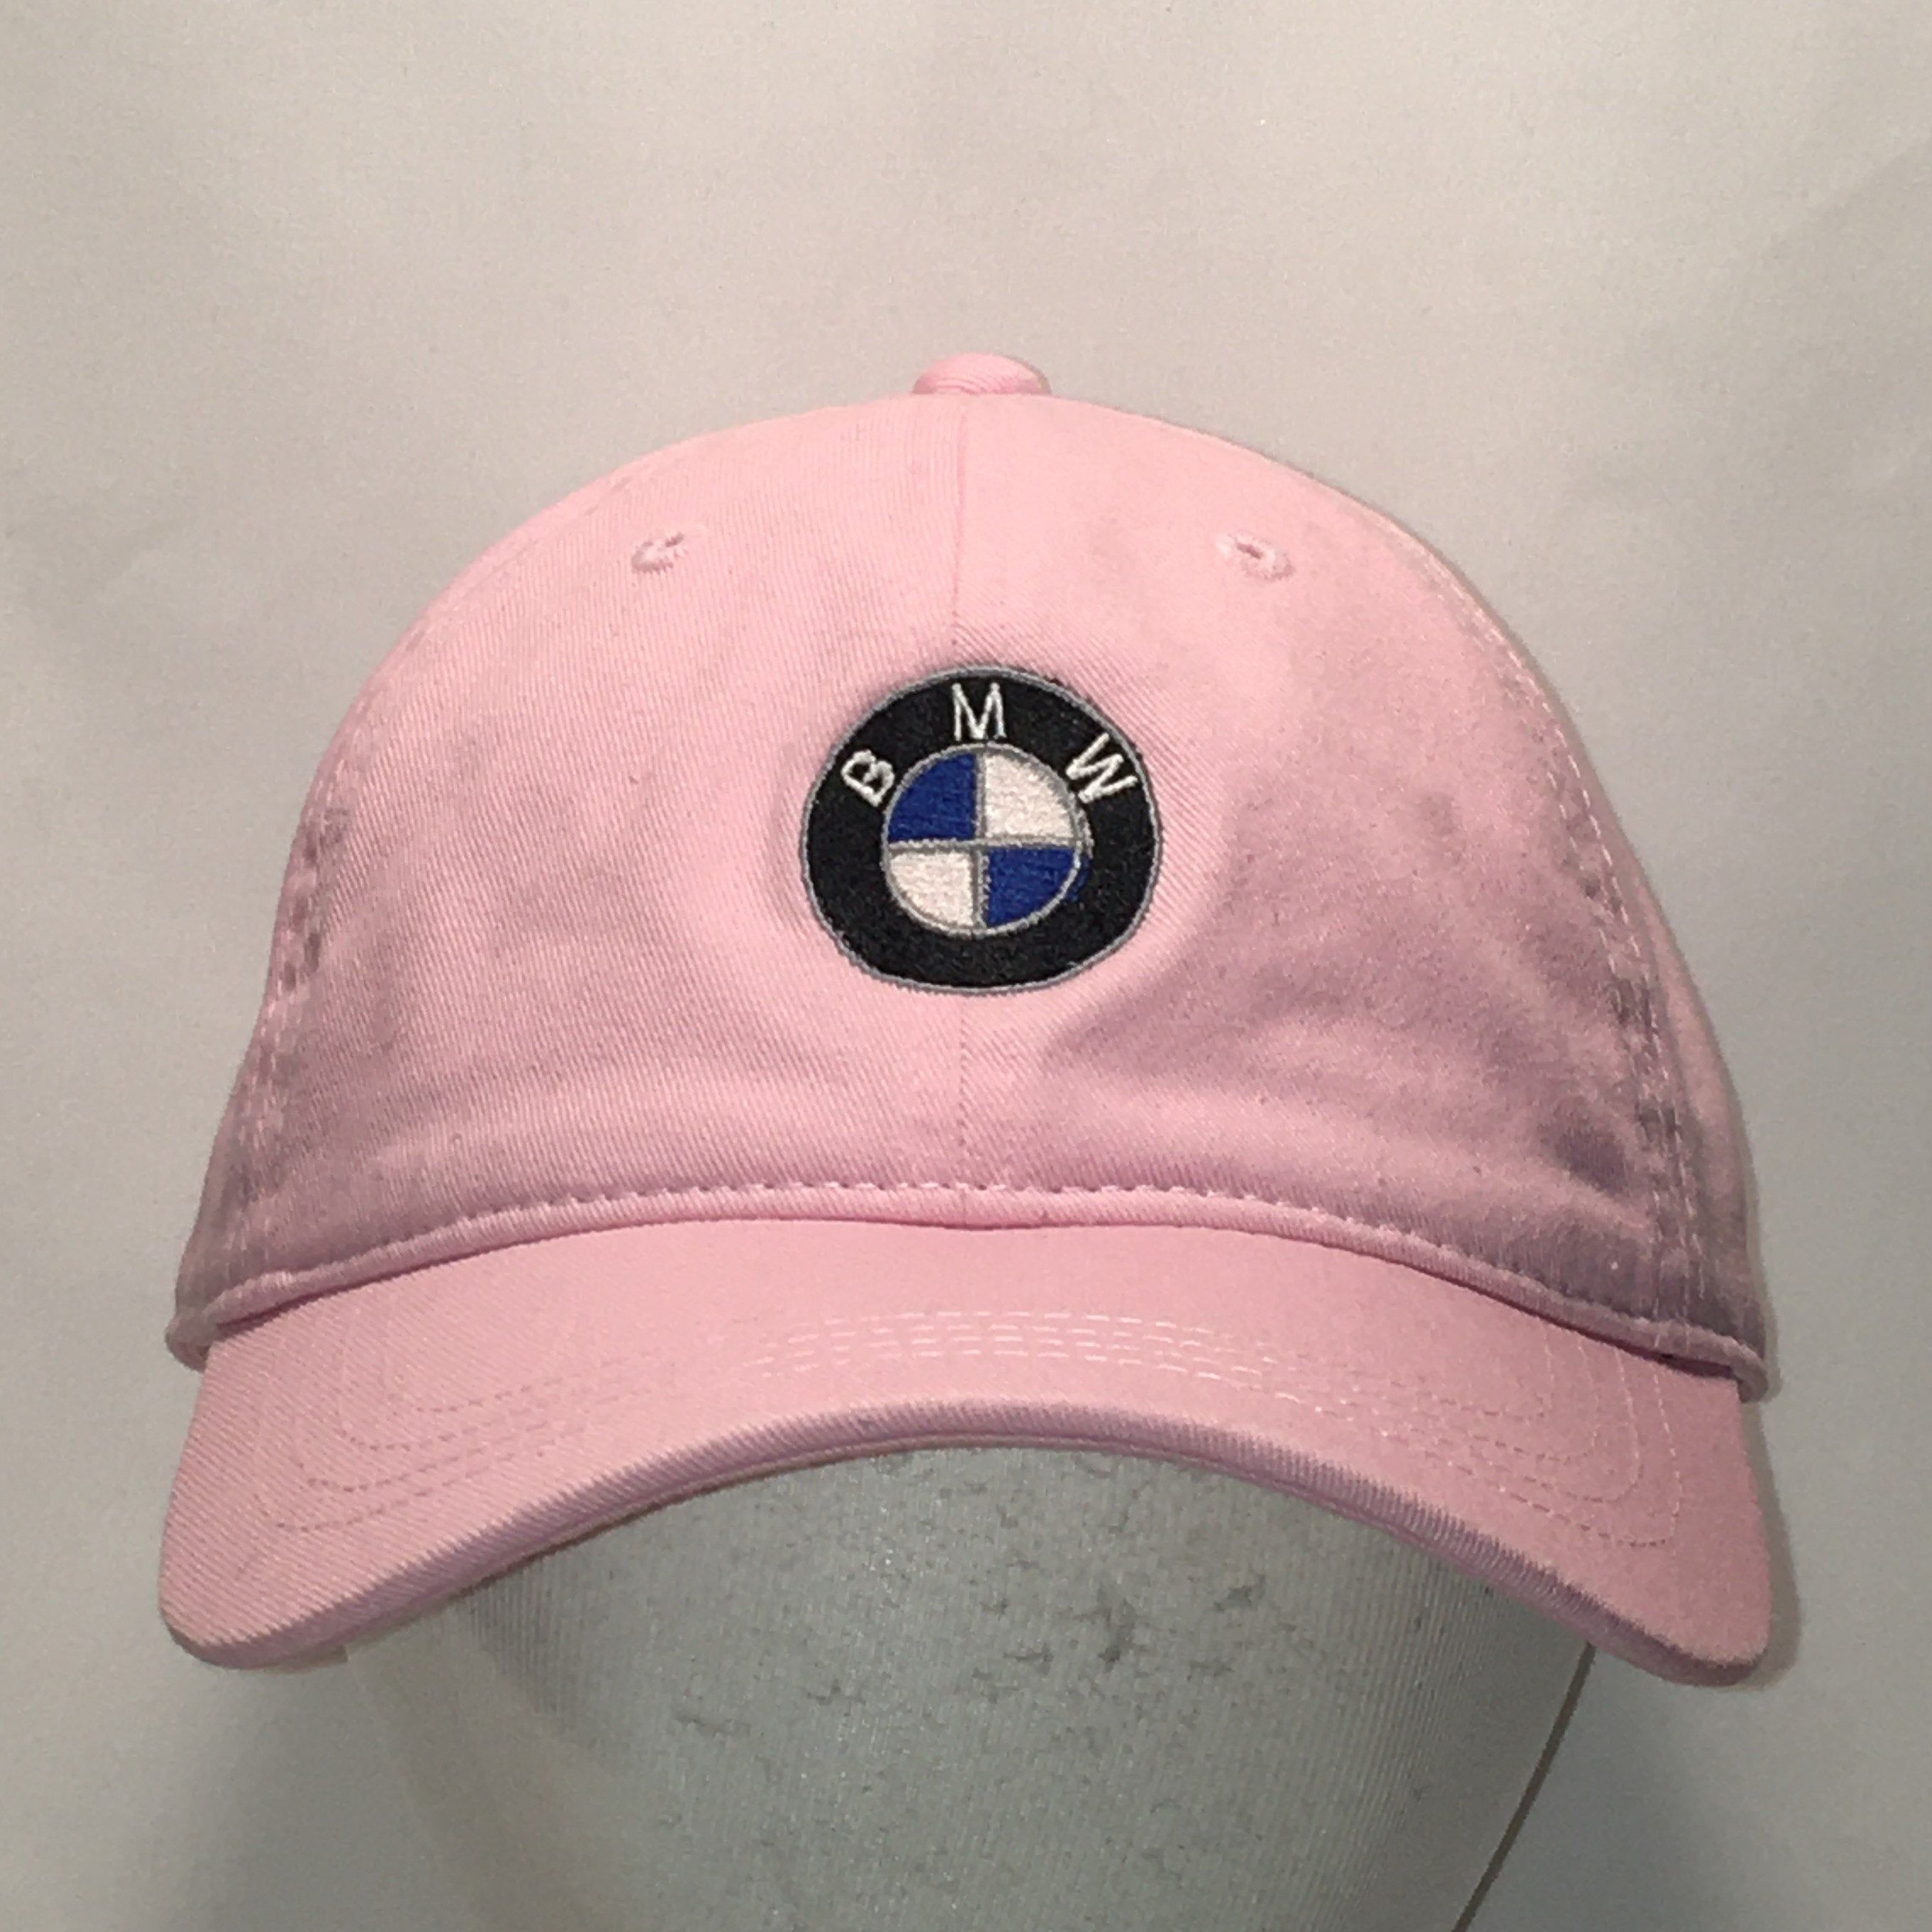 Vintage BMW Strapback Hat Pink Womens Baseball Hats Mom